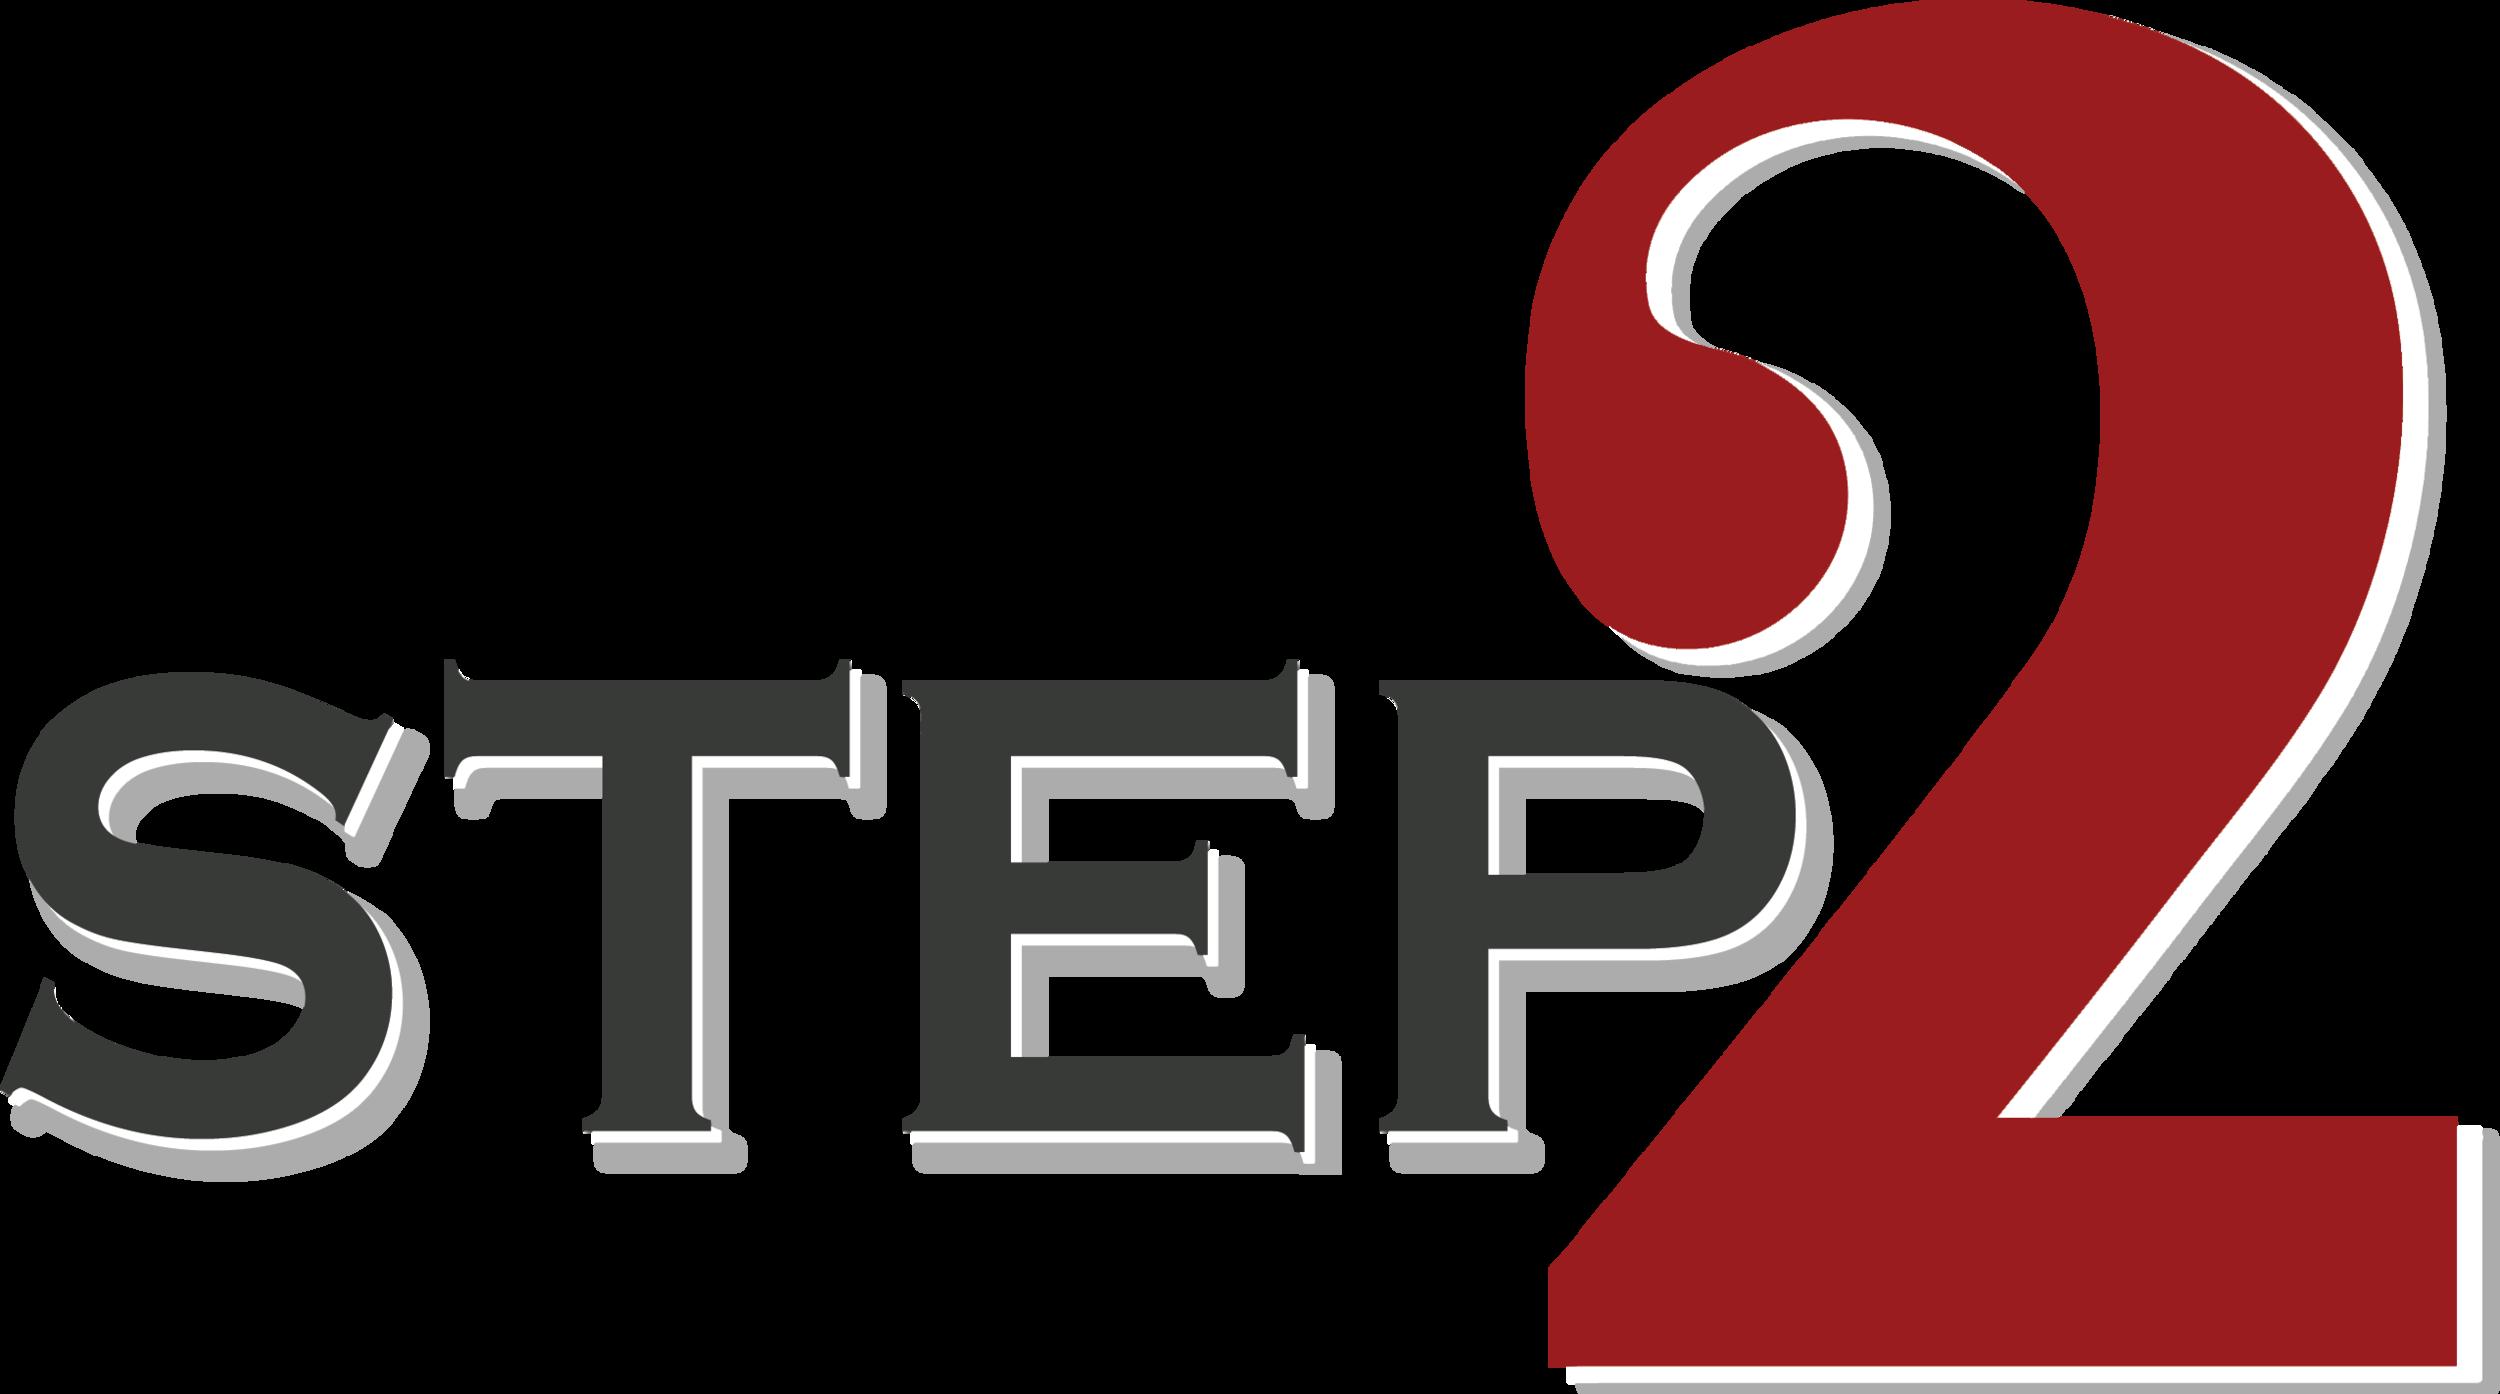 STEP2 logo.png